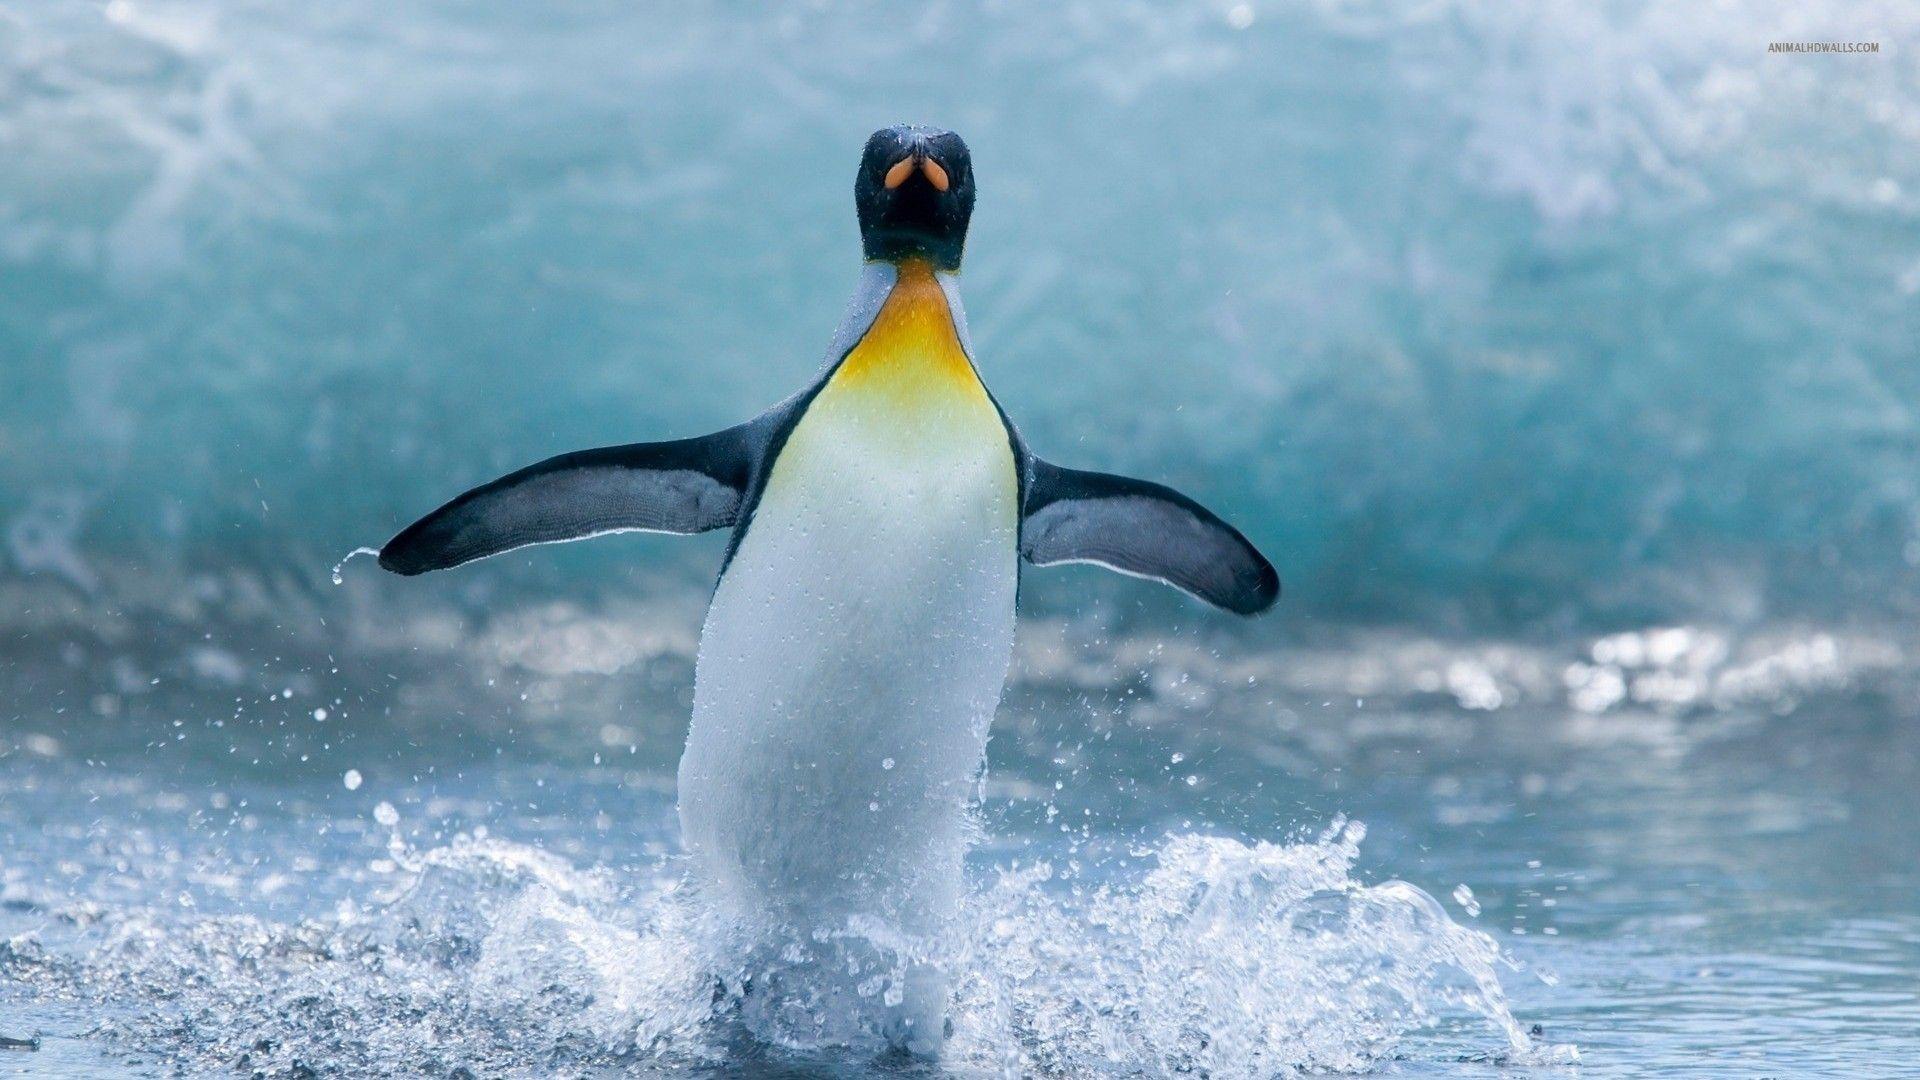 penguin 776 1920x1080 Penguin Wallpaper Penguins Animals 1920x1080